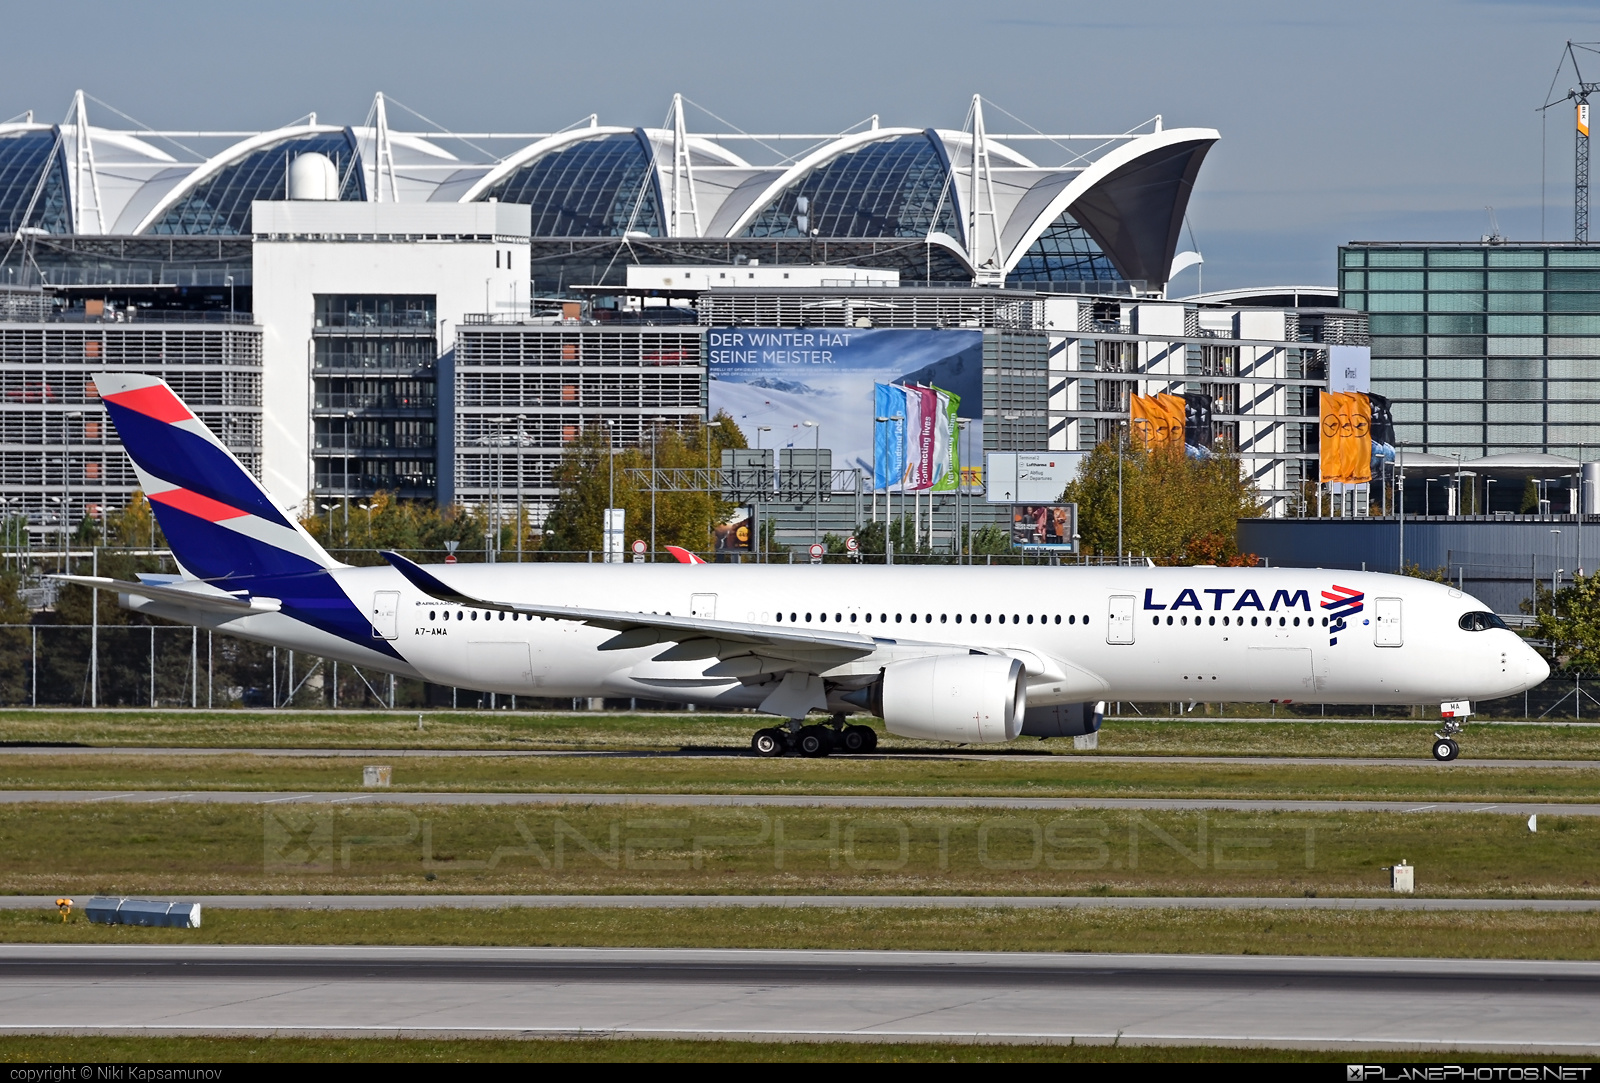 Qatar Airways Airbus A350-941 - A7-AMA #a350 #a350family #airbus #latam #qatarairways #xwb